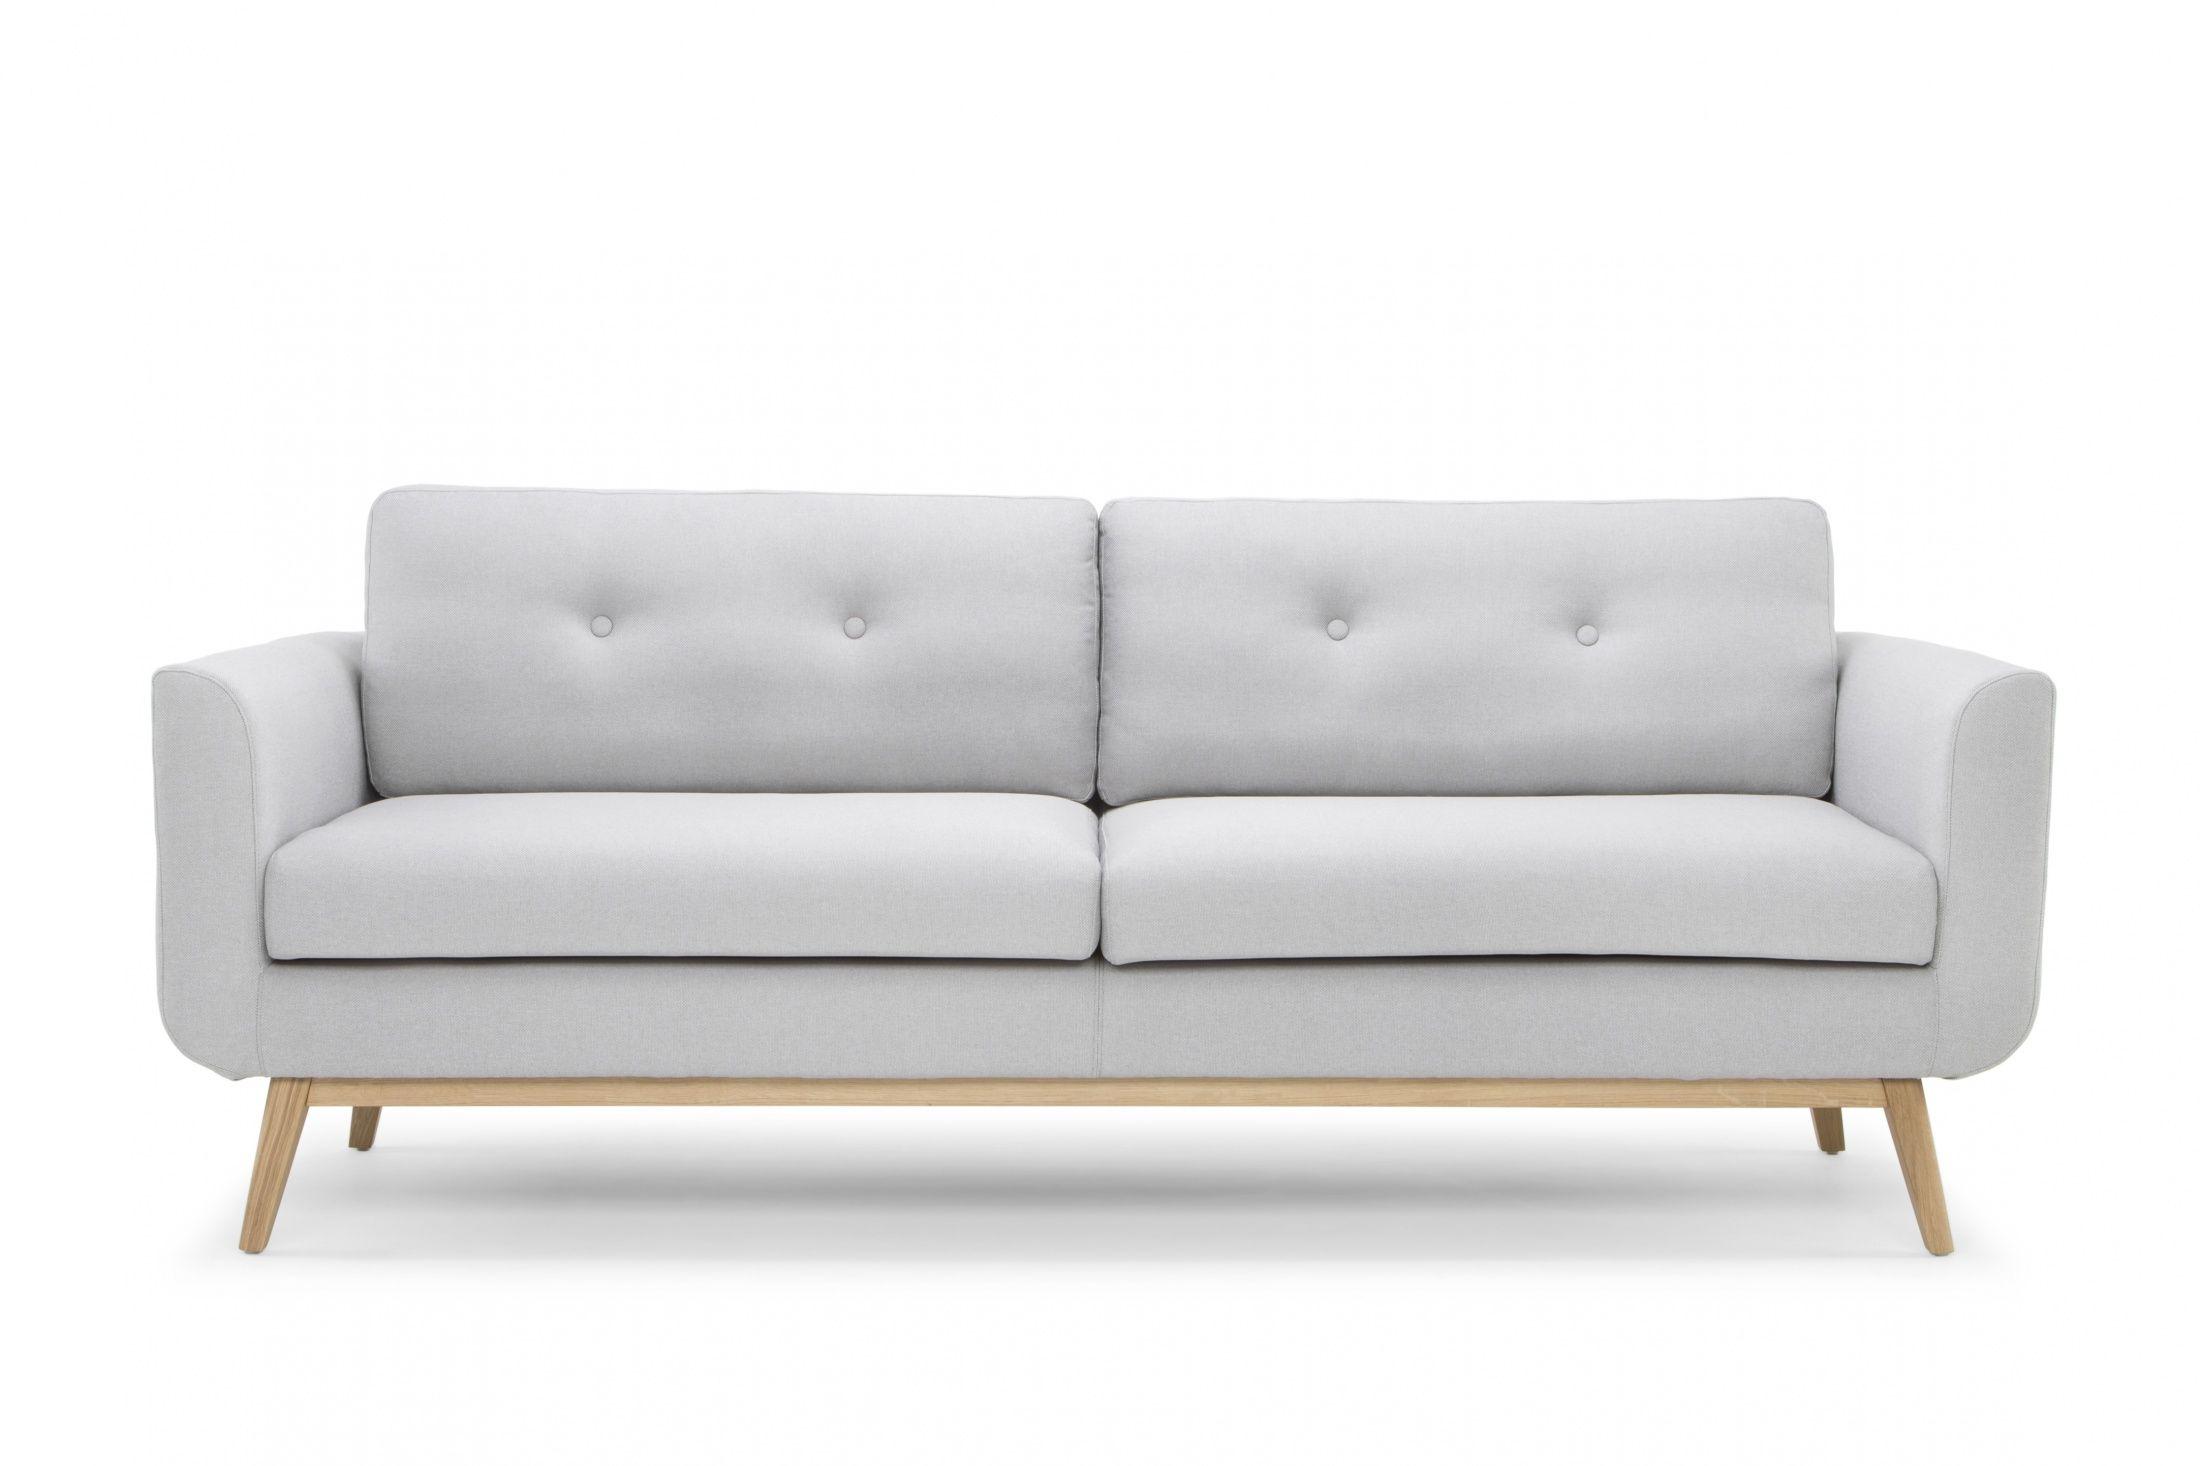 Freya Light Grey 3 Seat Sofa With Wood Legs Front View Sofa Design Sofa Light Gray Sofas